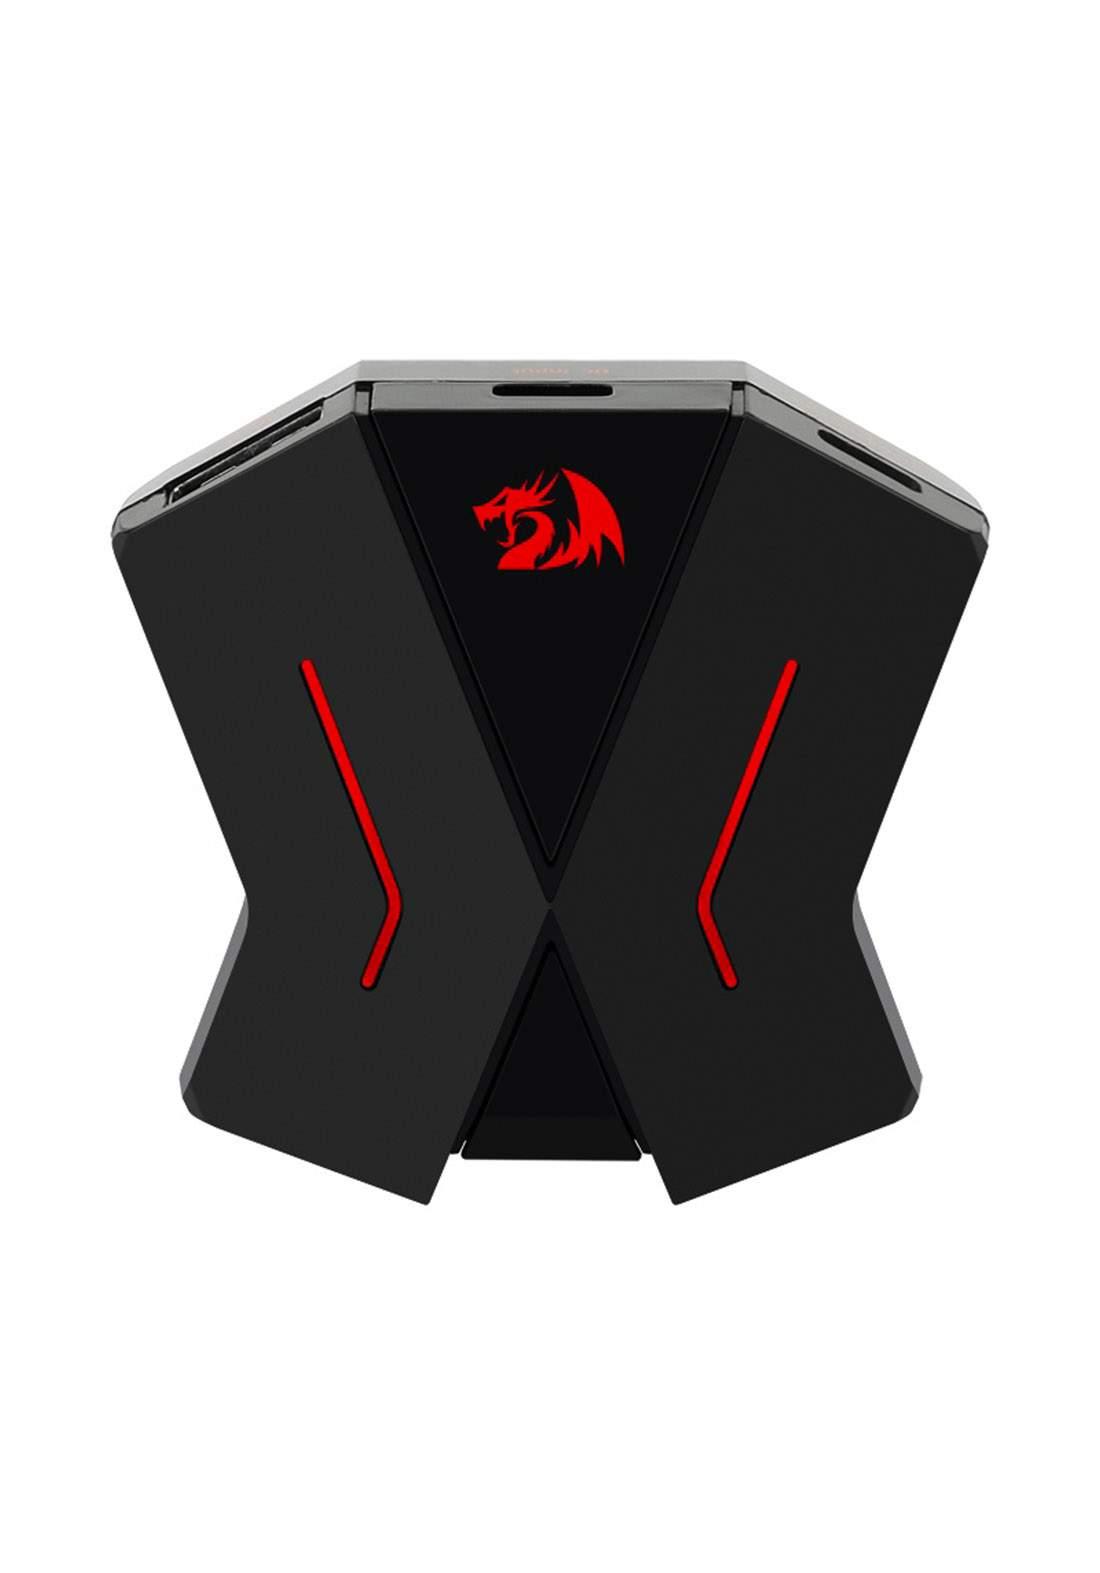 Redragon GA-200 Keyboard&Mouse Converter - Black تحويلة